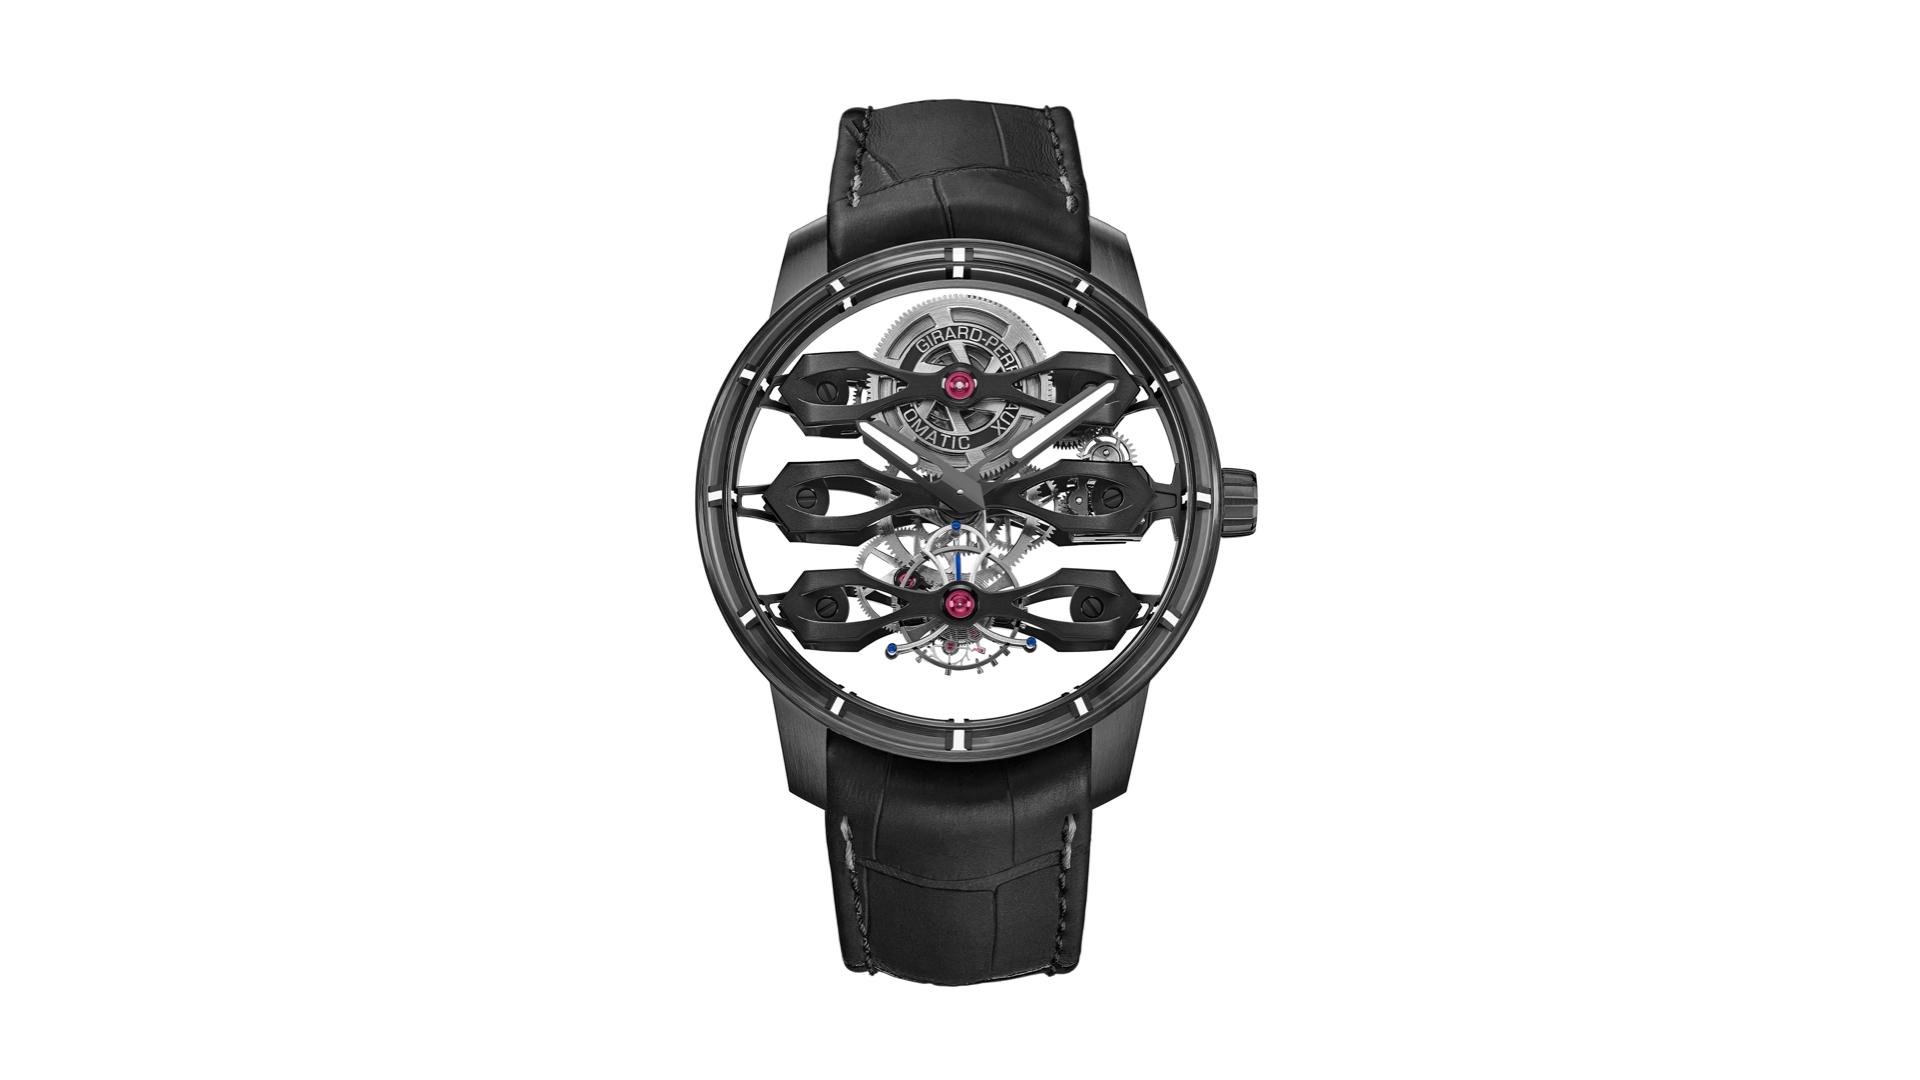 Girard Perregaux aston martin watch